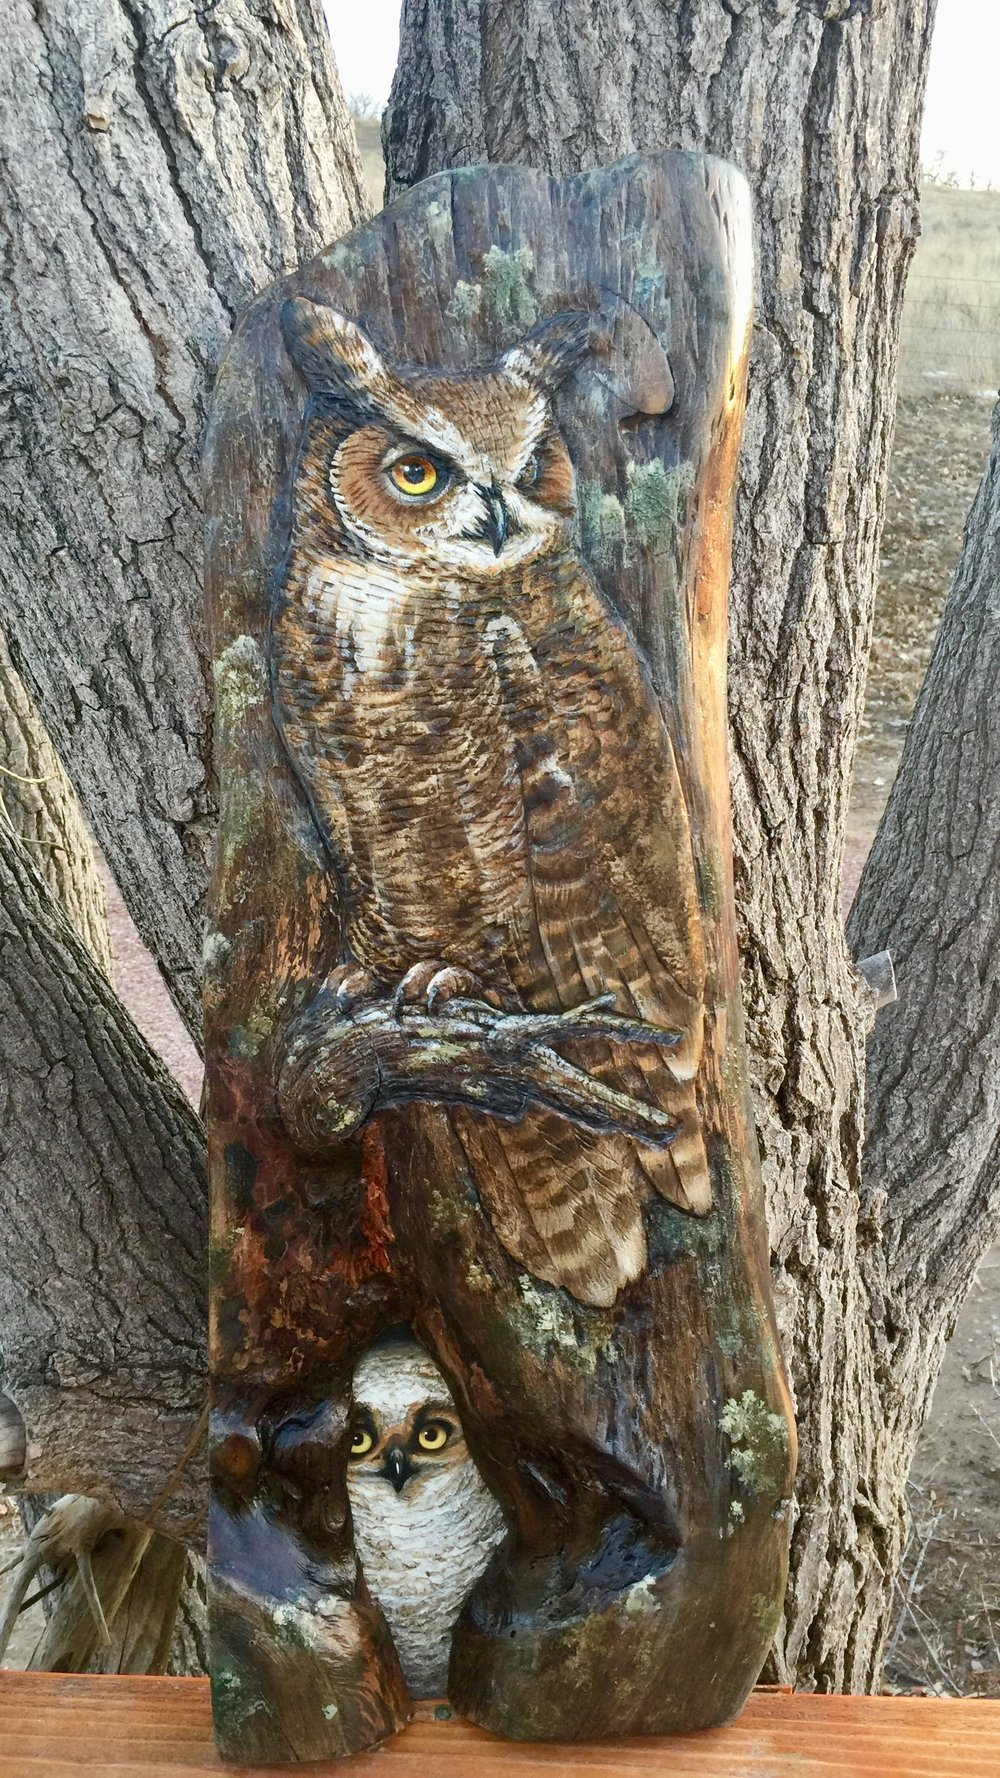 Great Horned Owl's on wood - by ©Liz Goodrick-Dillon